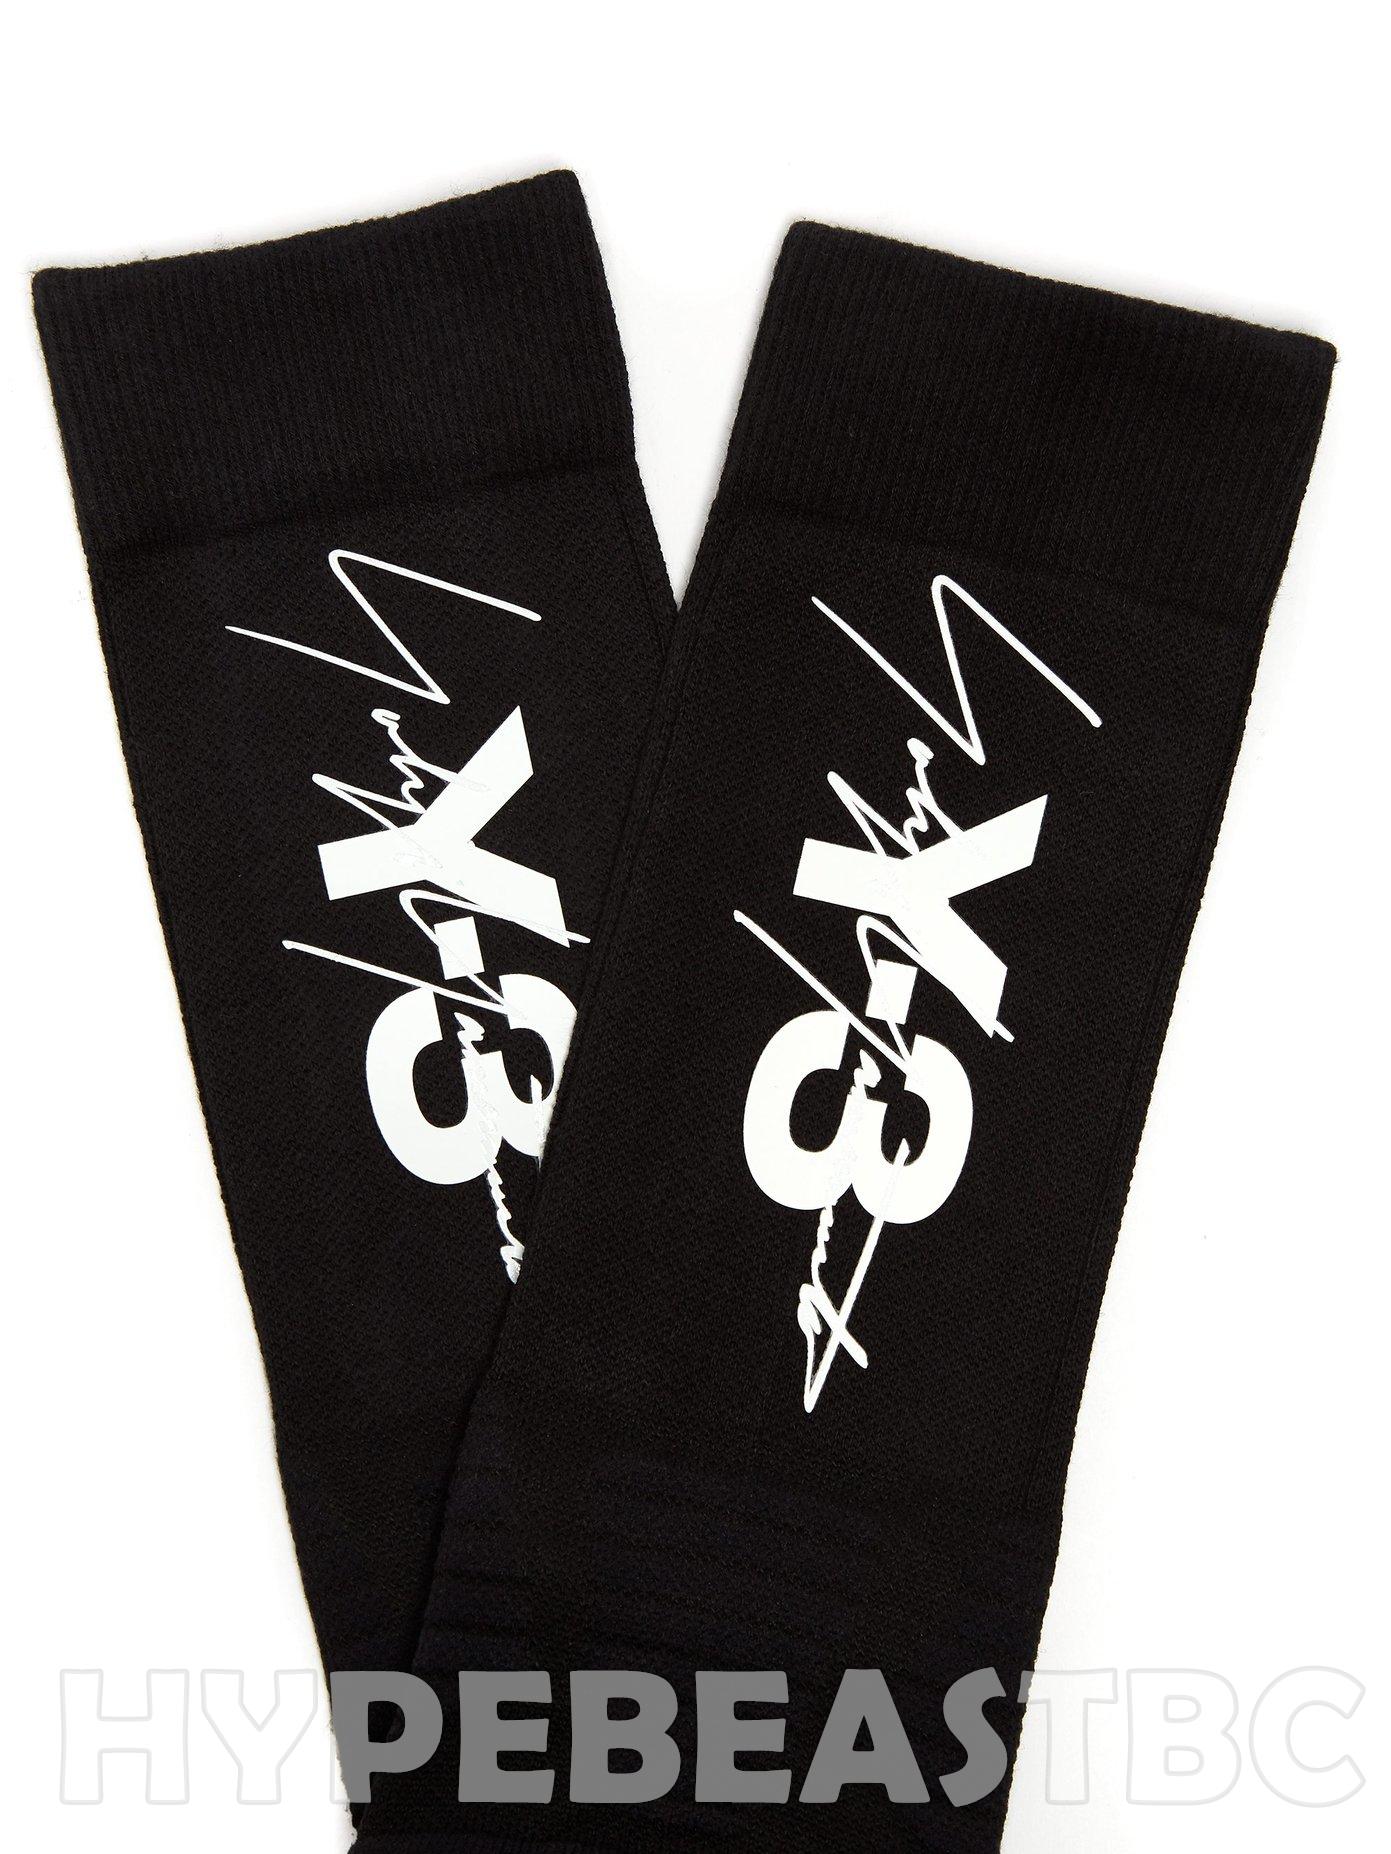 e6fbeed825a0f Adidas Y-3 Socks Tube Signature Logo Sports Tech Adidas X Yohji ...